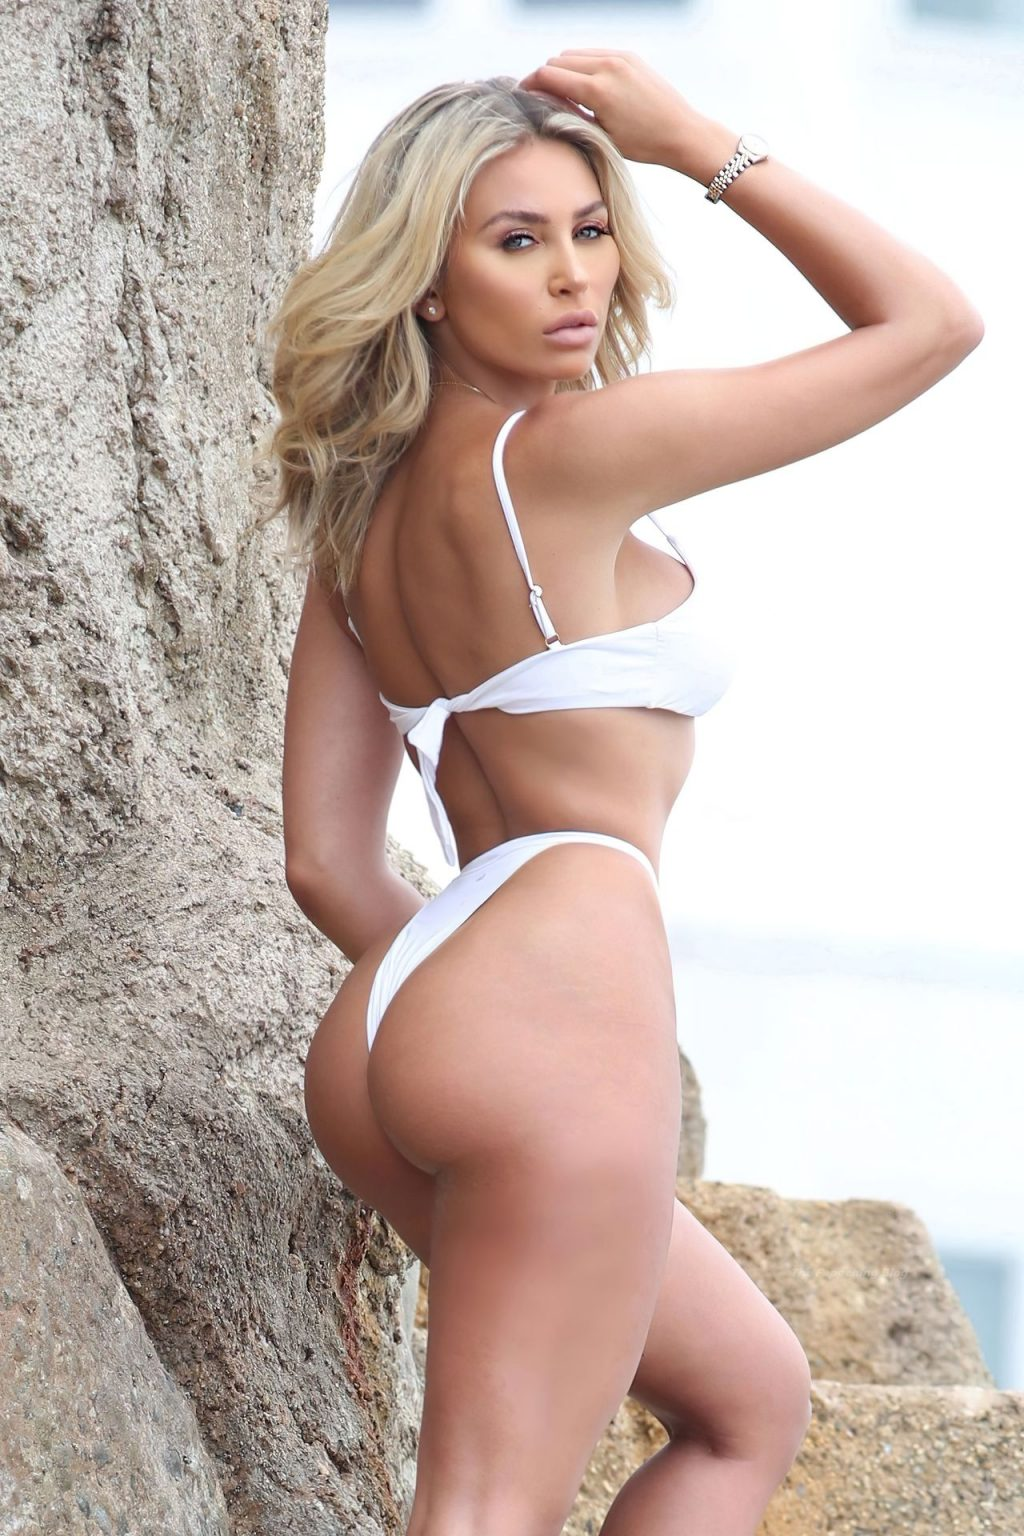 Khloe Terae Looks Sexy in a White Bikini (11 Photos)